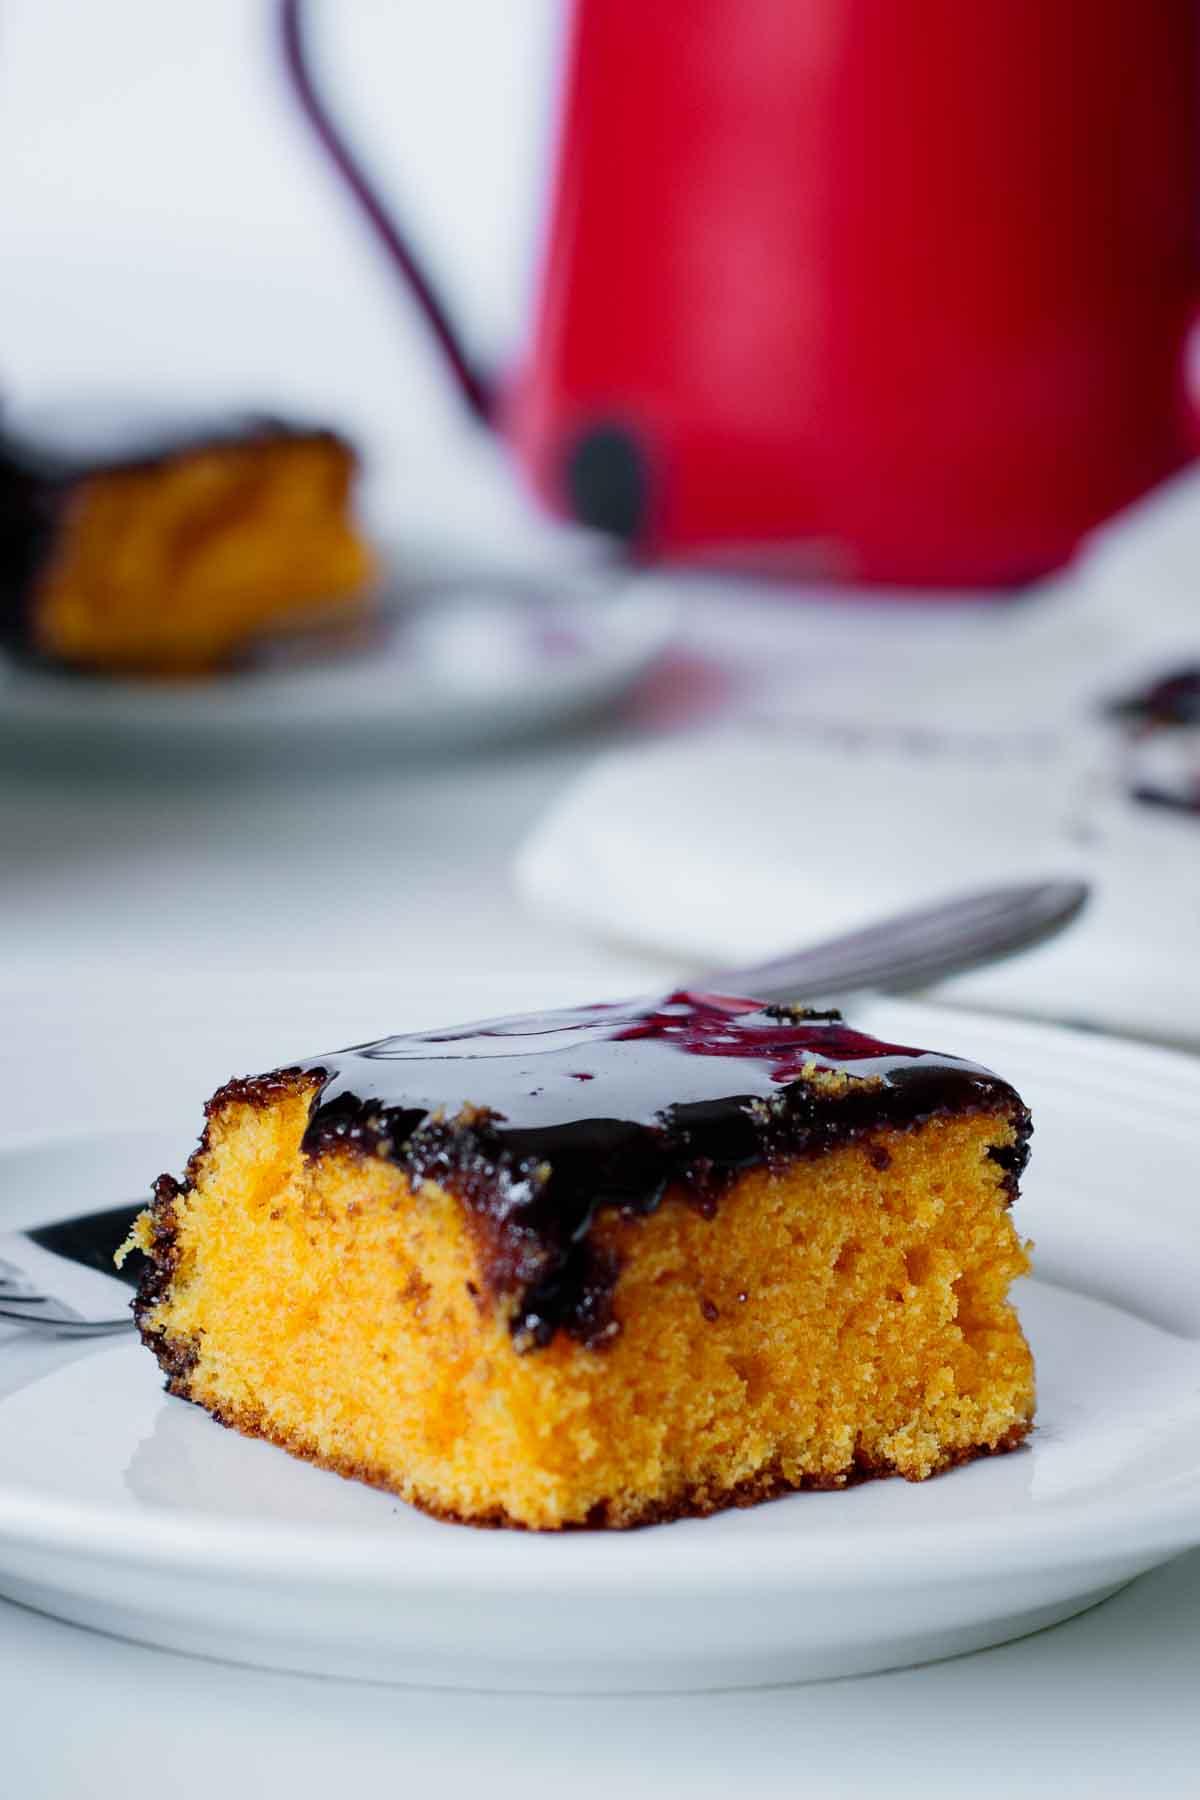 A piece of brazilian carrot cake with shiny chocolate glaze.